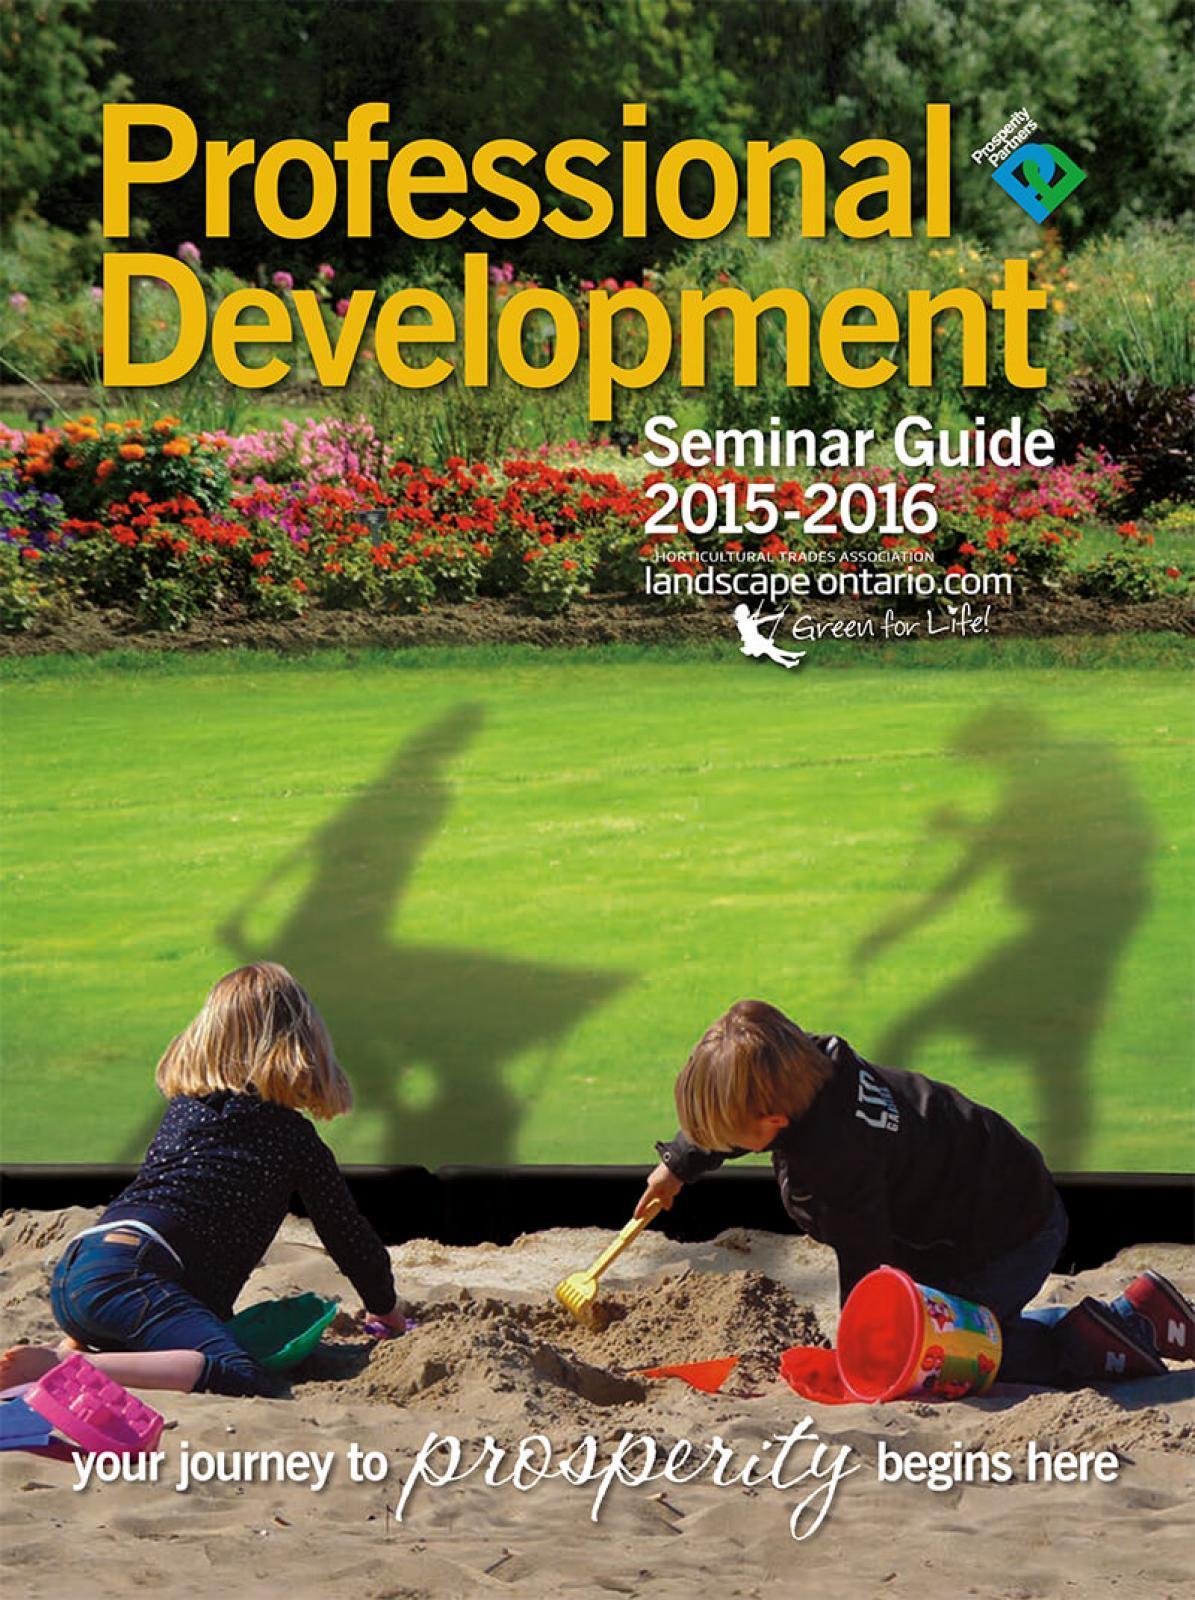 2015-2016 Professional Development Guide